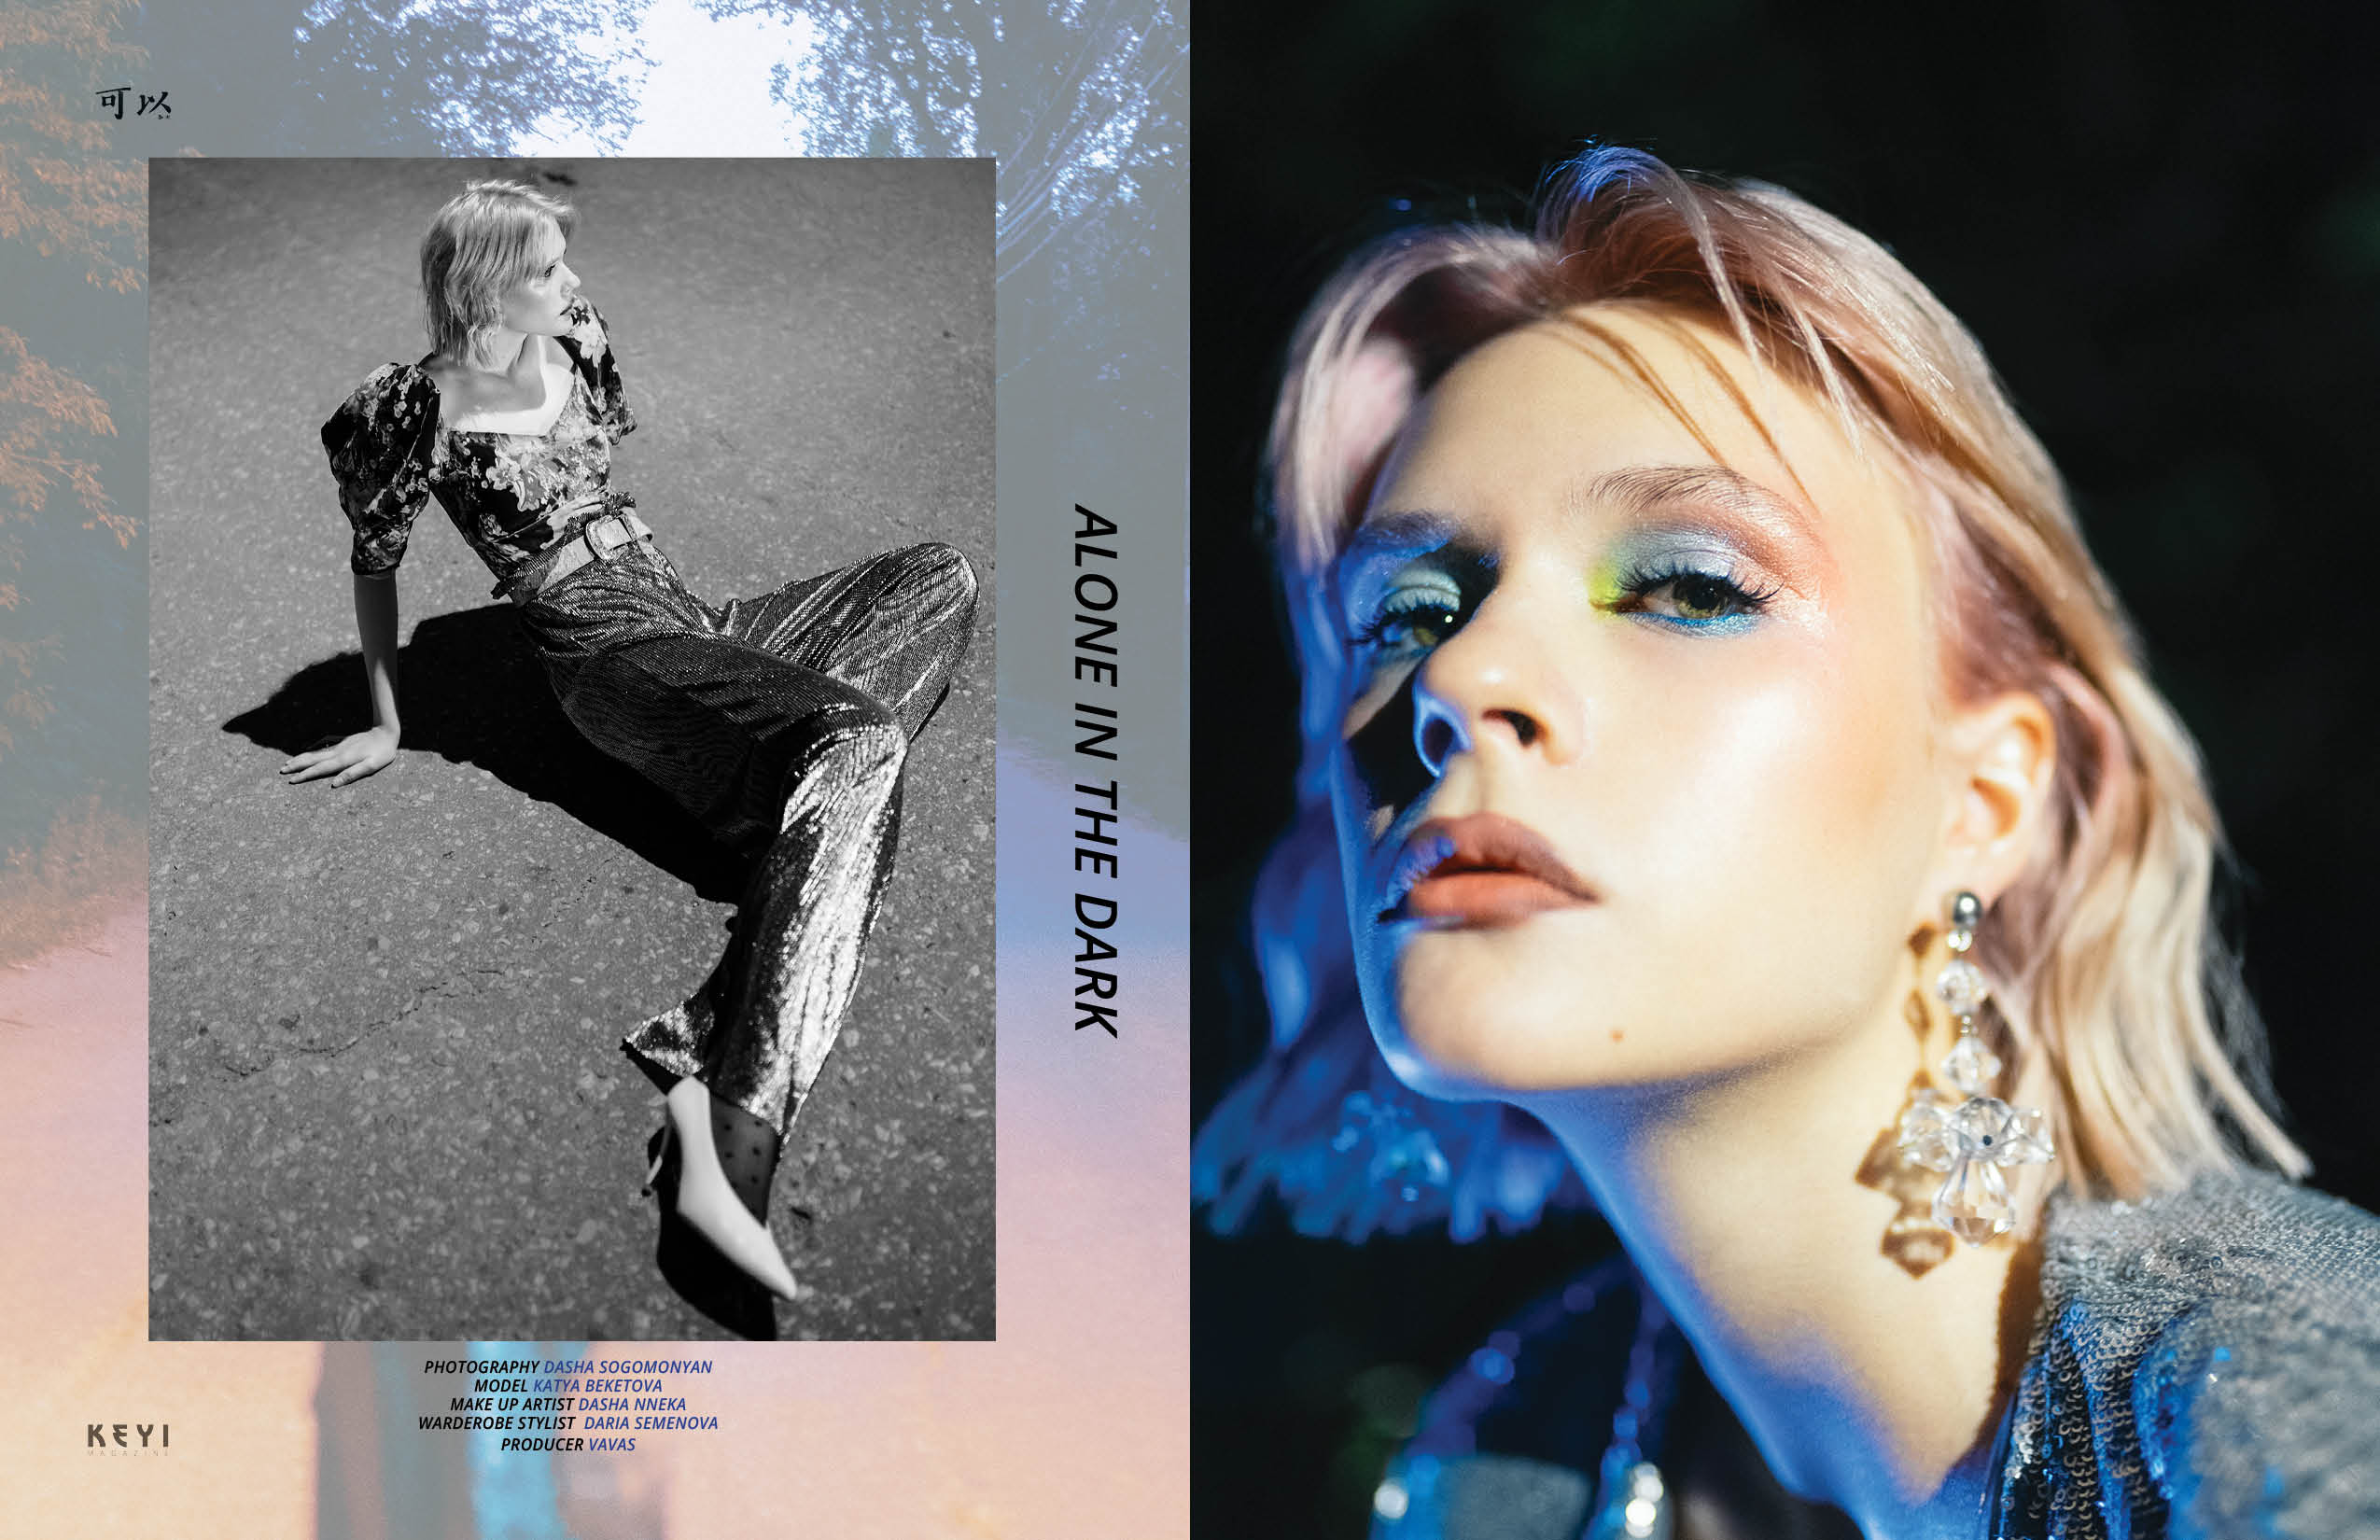 Photoshoot for Keyi Magazine Berlin by Dasha Sogomonyan with Katya Beketova from Fmm Fox model management Ukraine